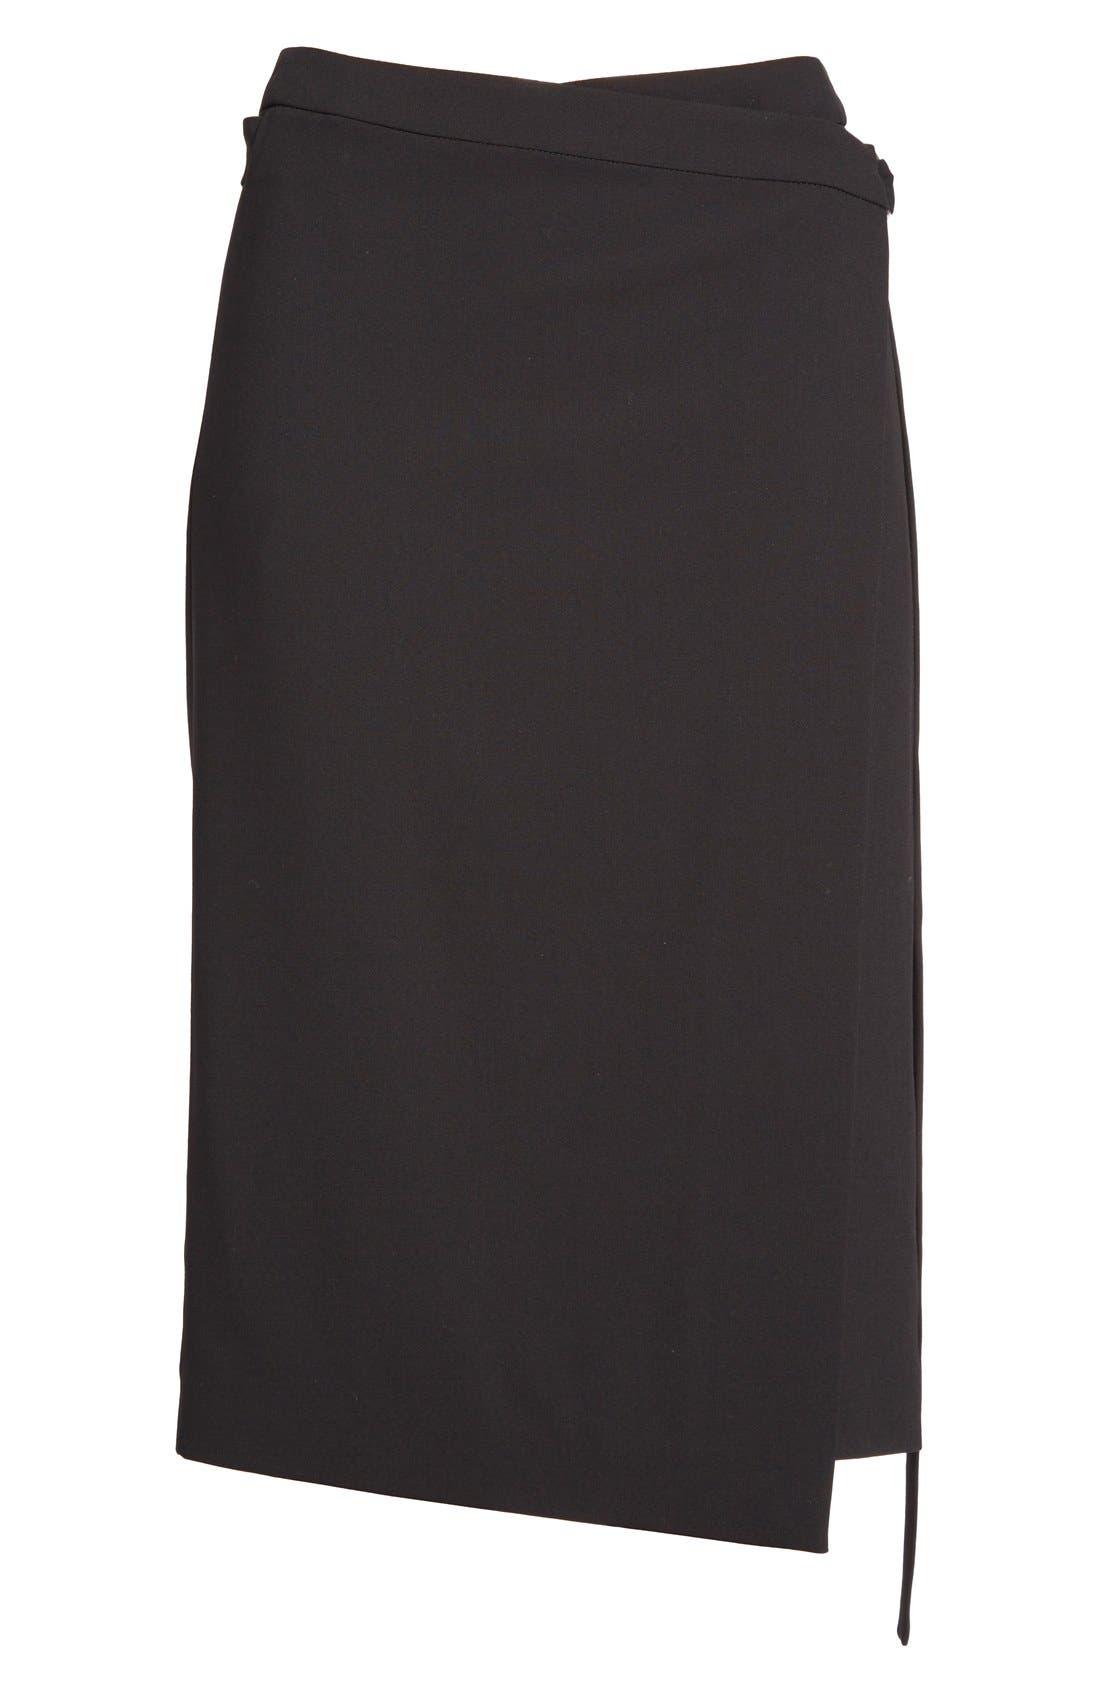 Alternate Image 4  - Michael Kors Belted Wool Wrap Skirt